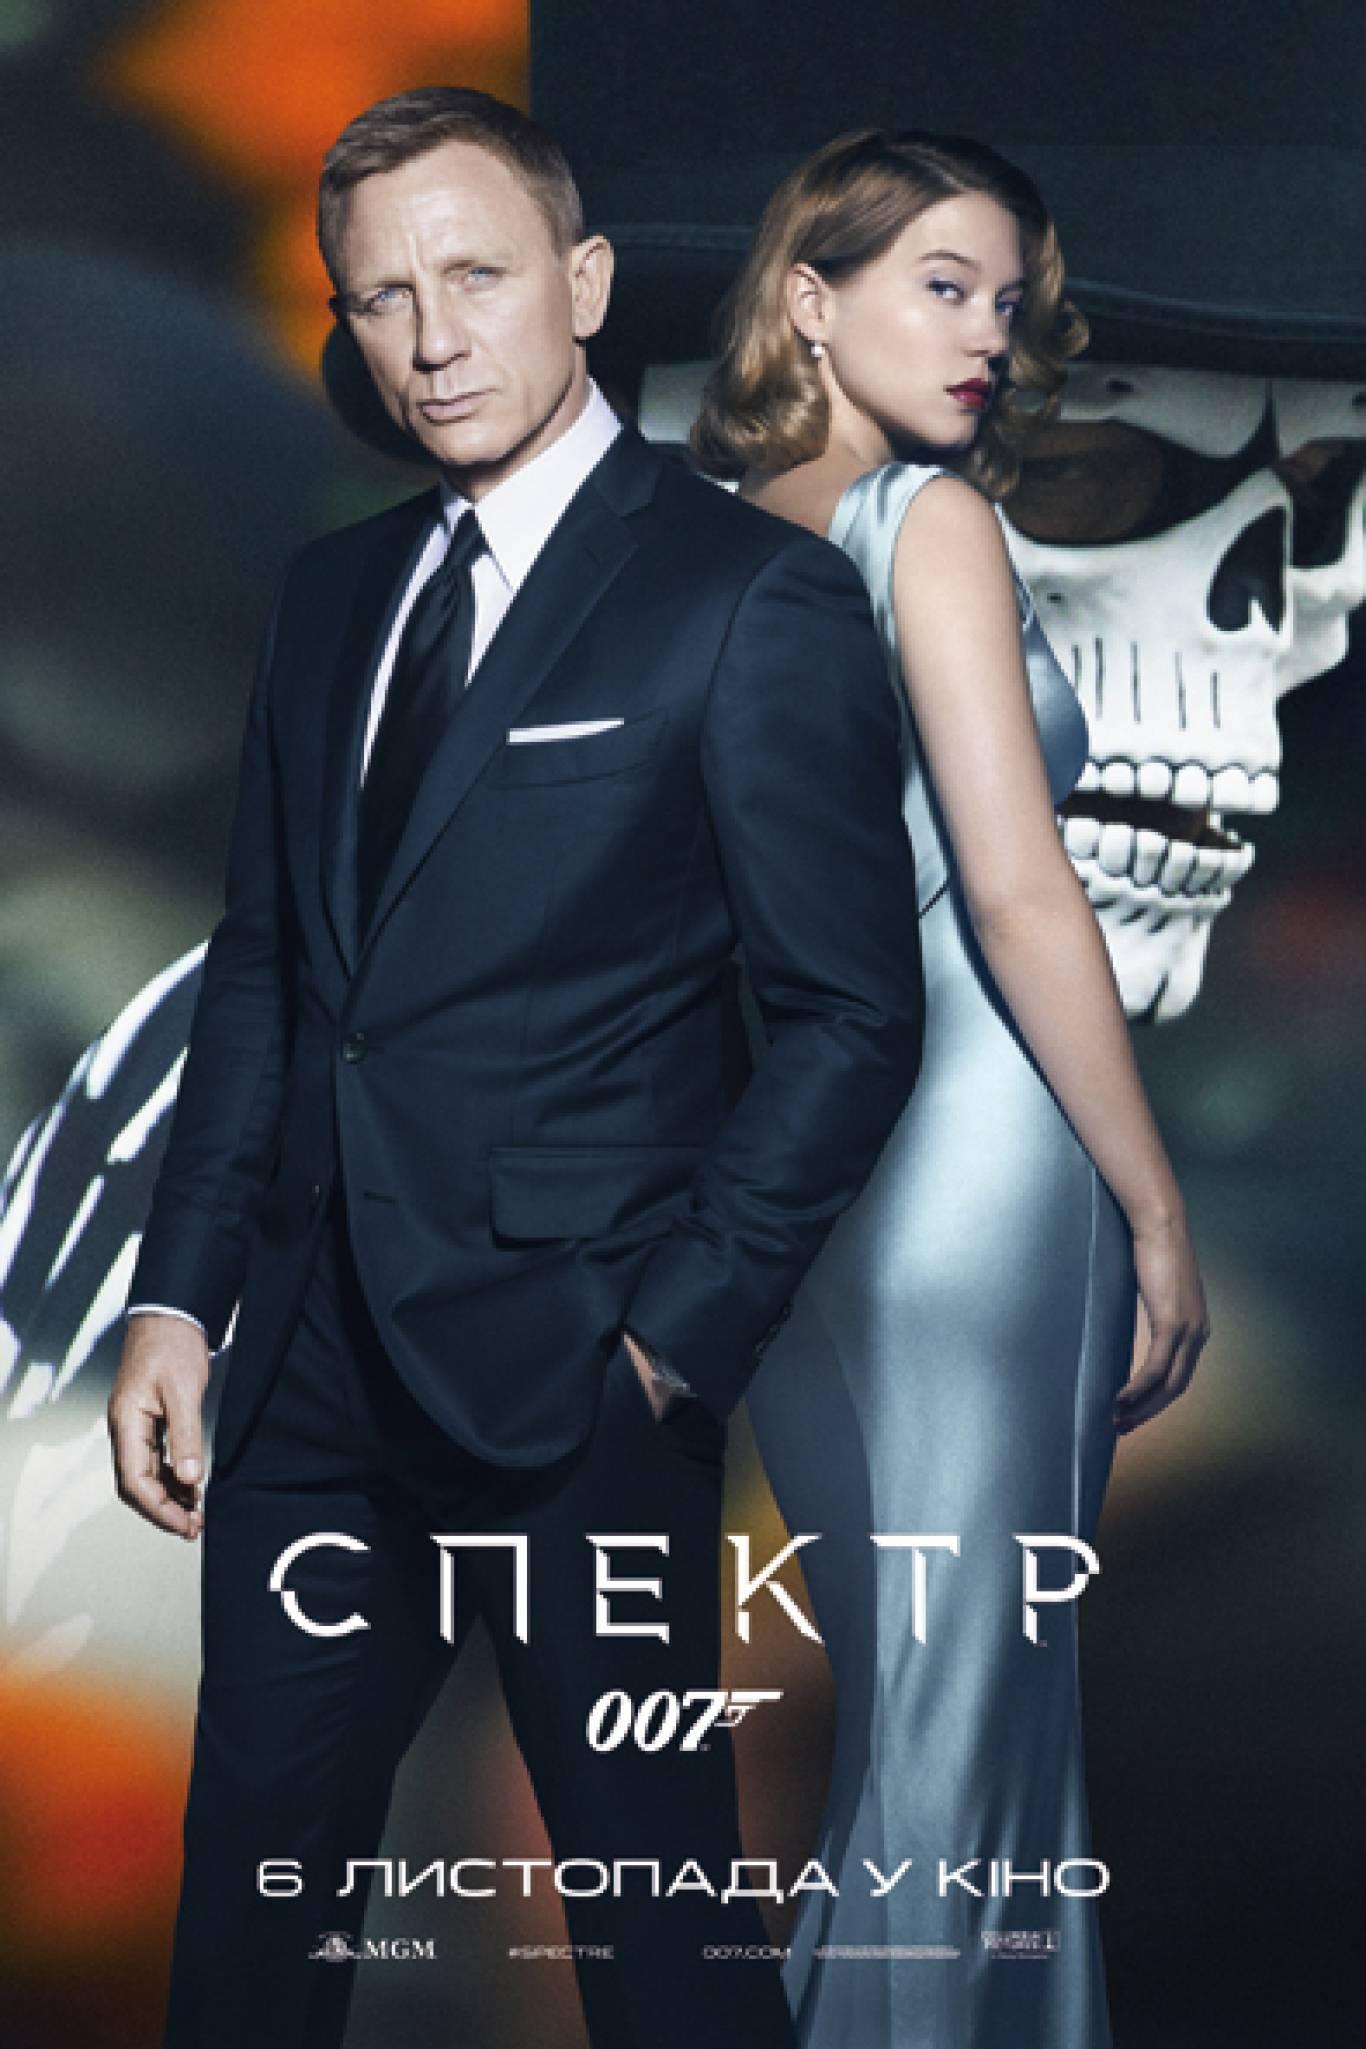 007: Спектр. Прем'єра пригодницького екшну про Джеймса Бонда